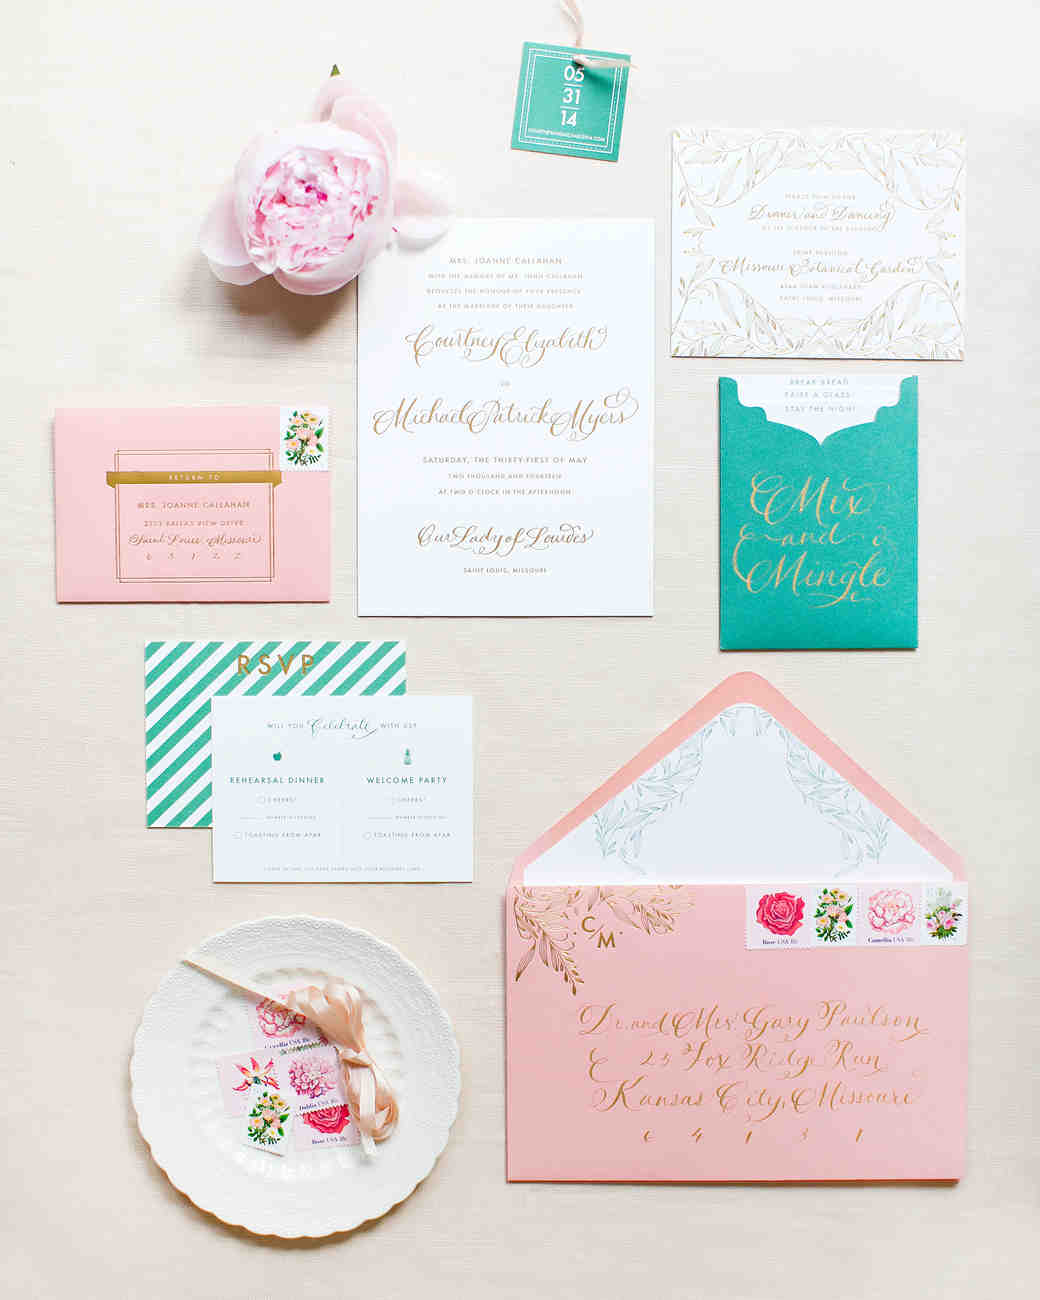 courtney-michael-wedding-01-s111677-0215.jpg